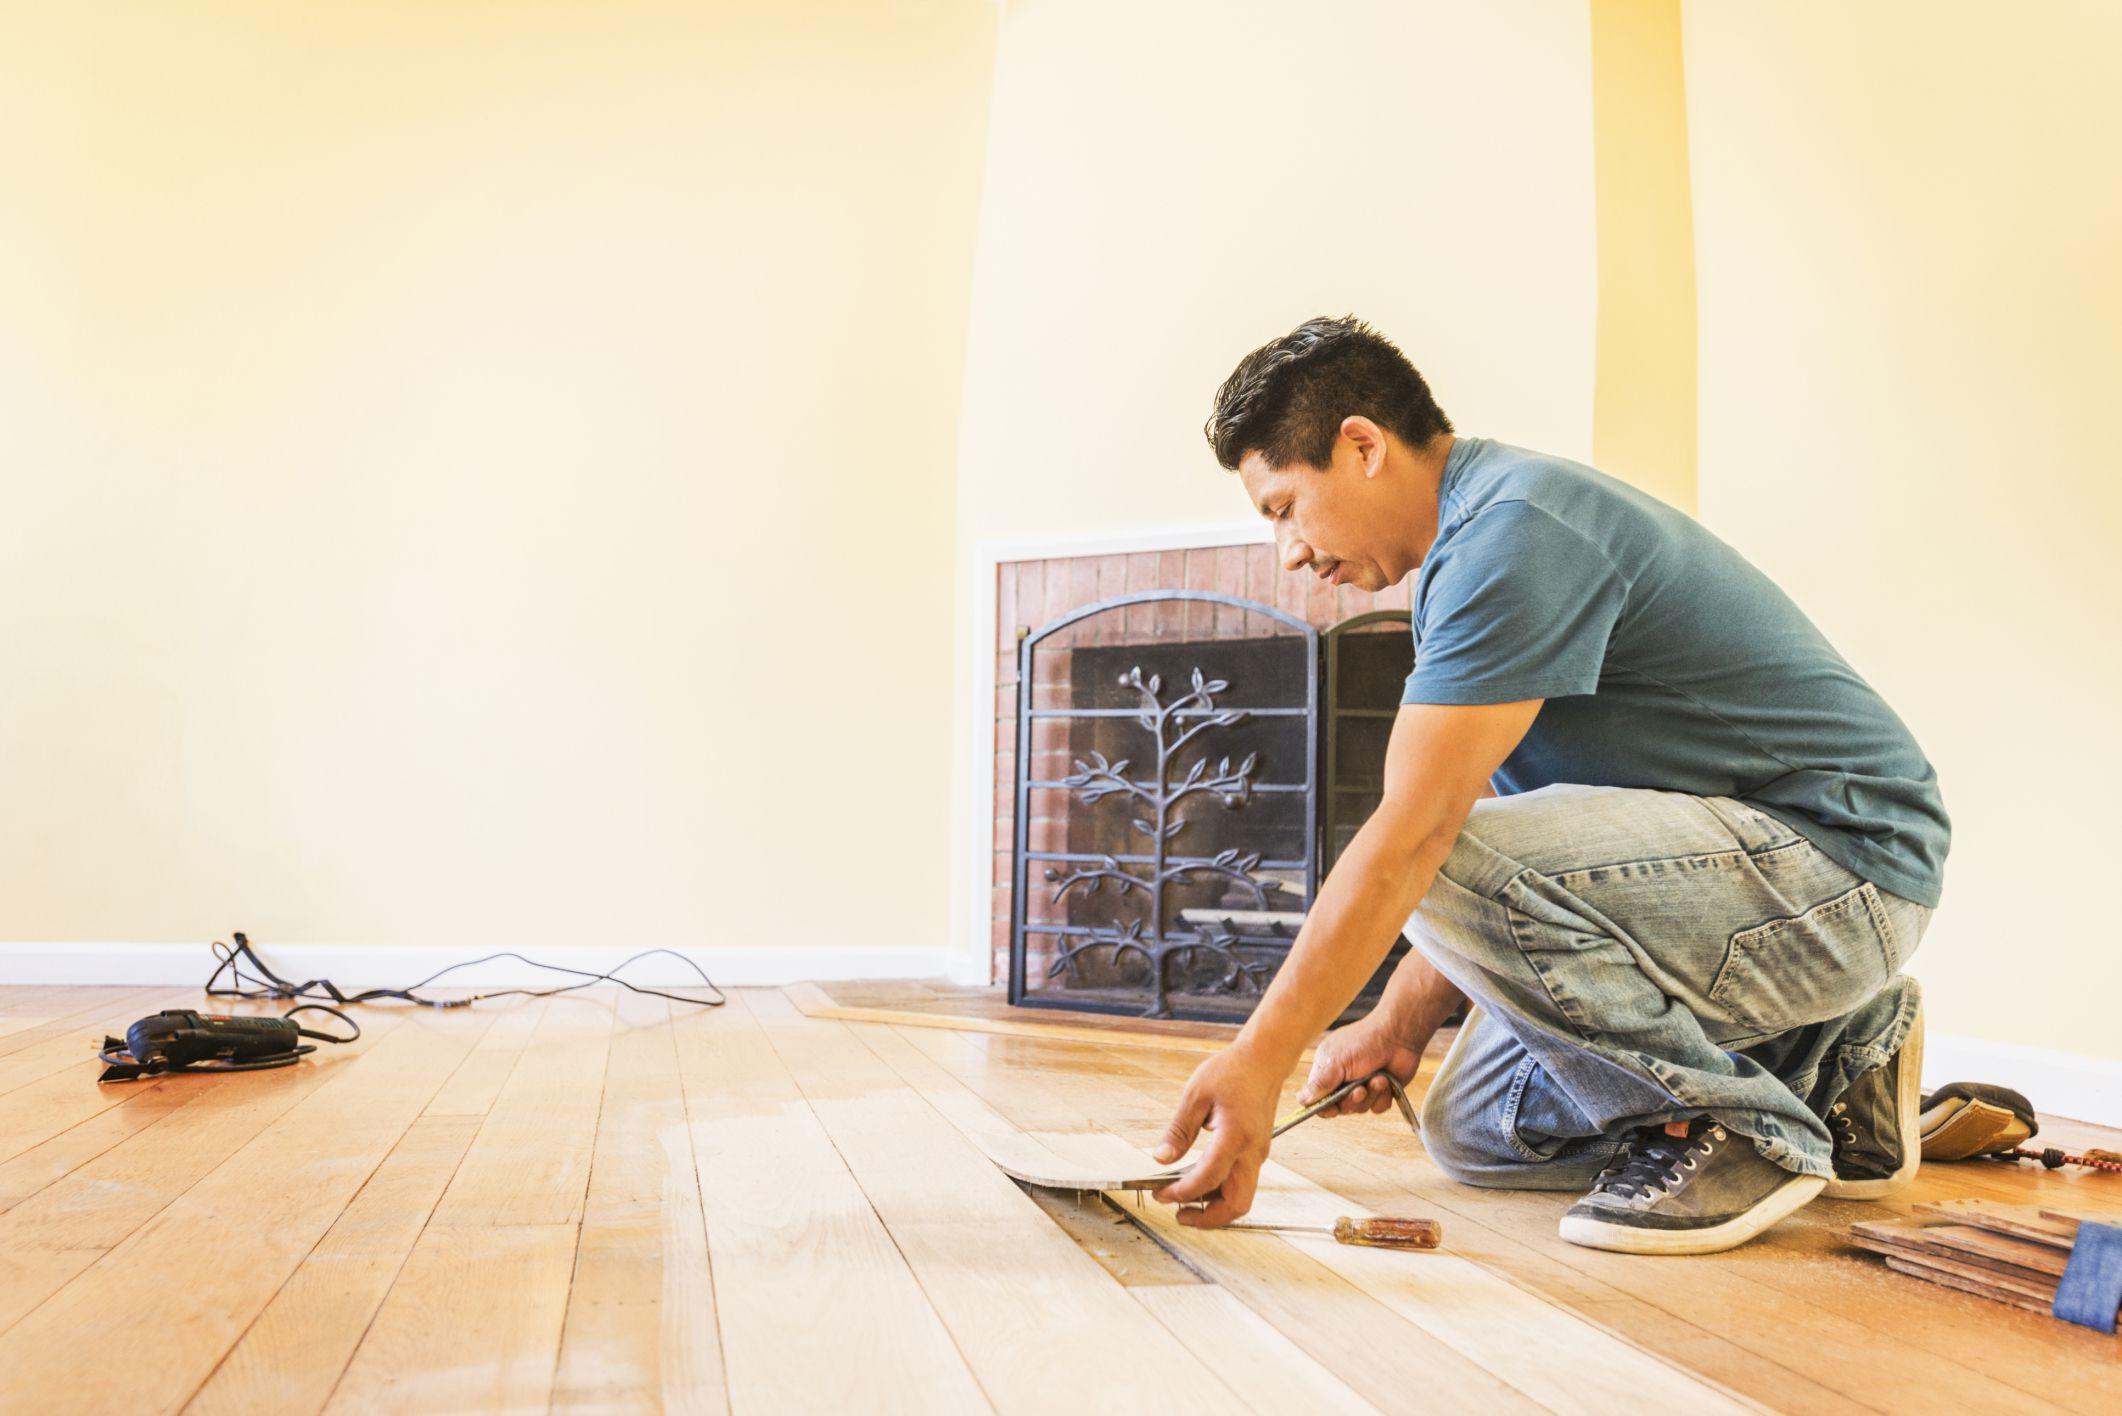 hardwood flooring per square foot of solid hardwood flooring costs for professional vs diy inside installwoodflooring 592016327 56684d6f3df78ce1610a598a